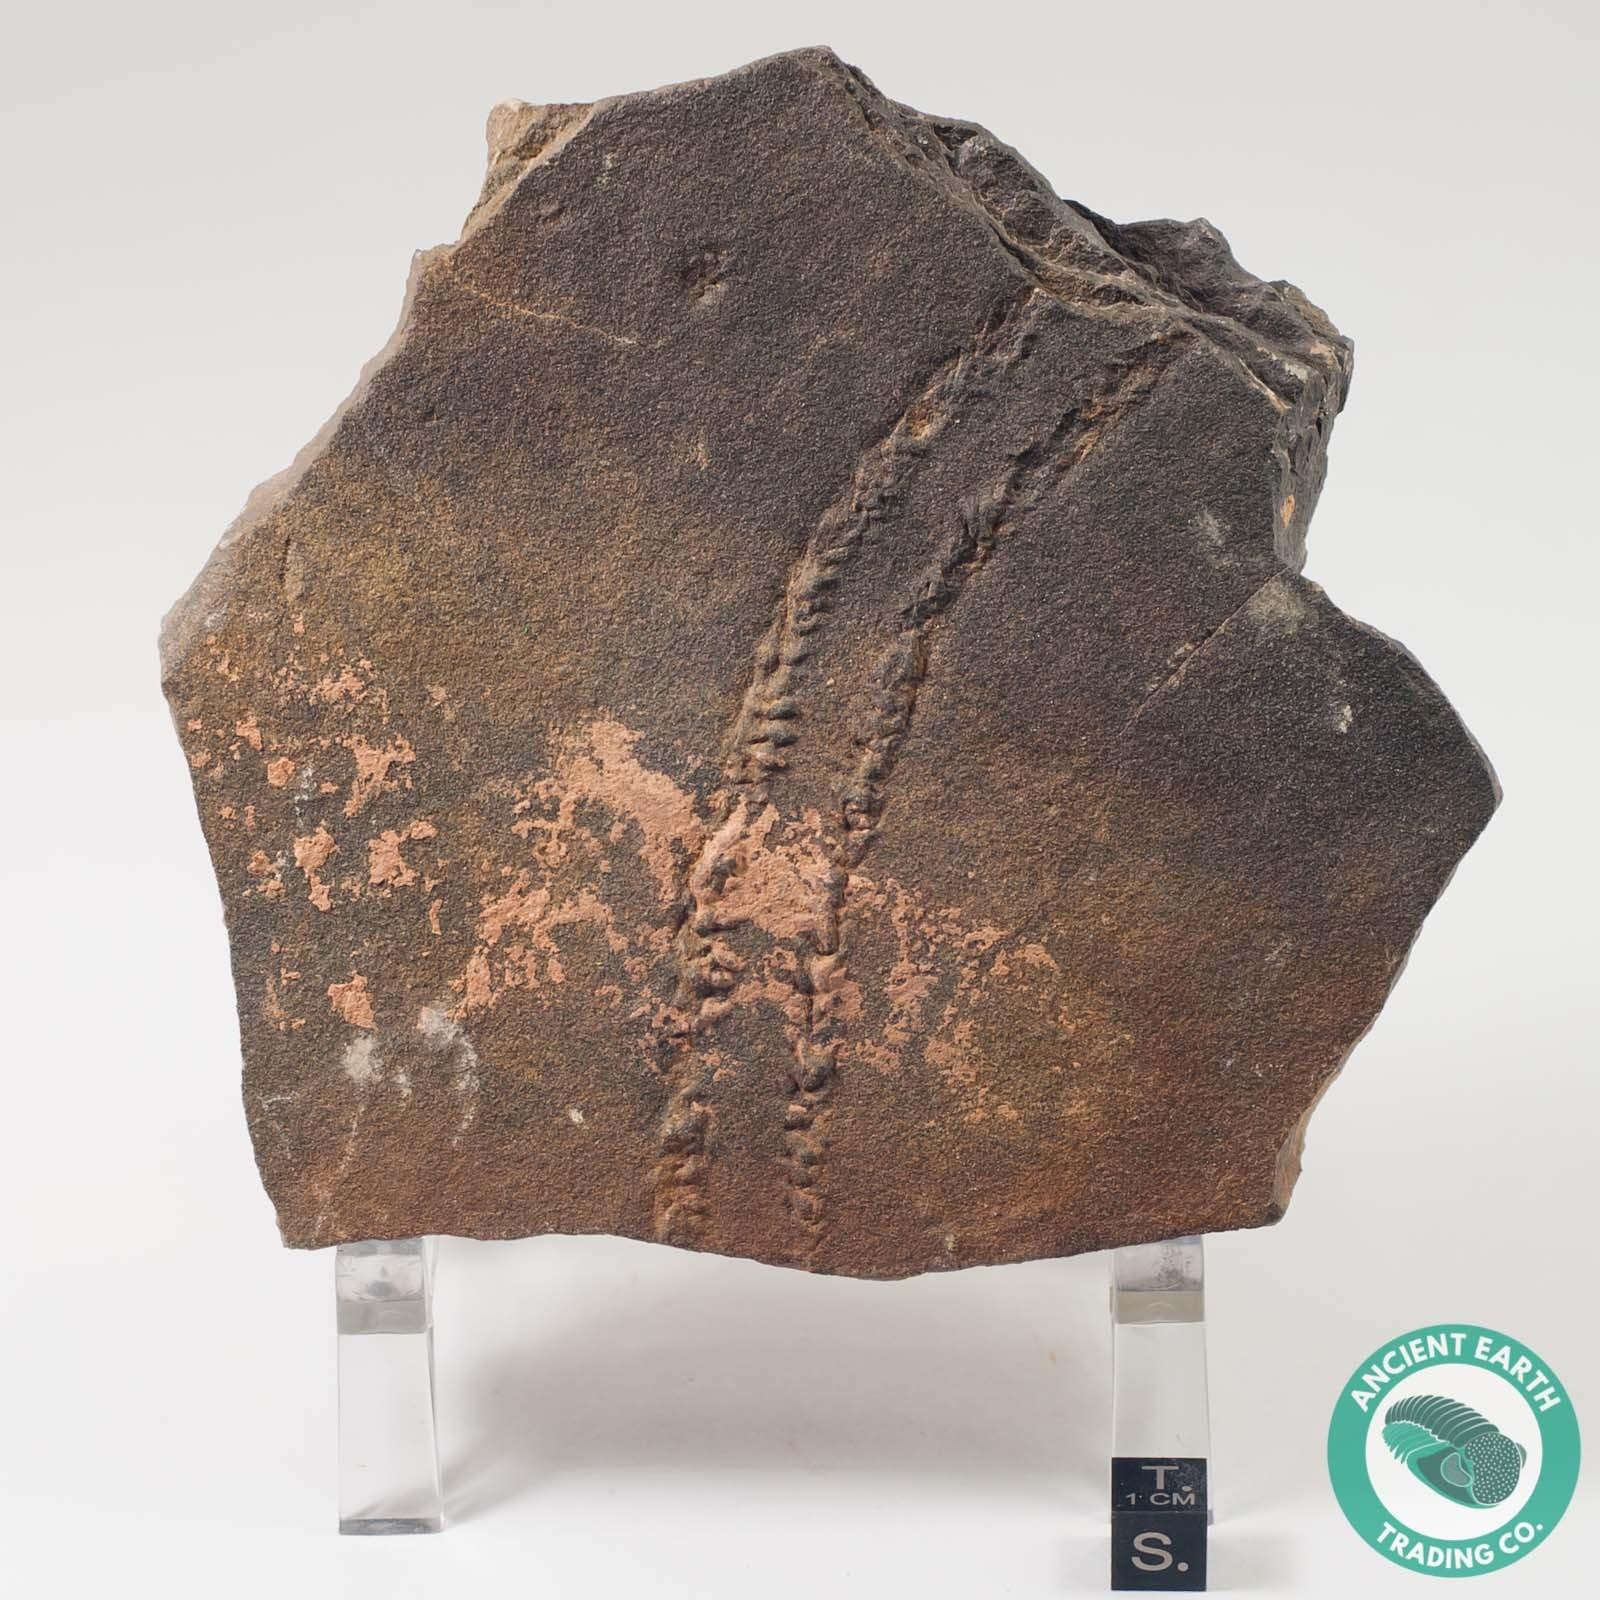 4.3 in. Cruziana Fossil Trilobite Tracks - Morocco